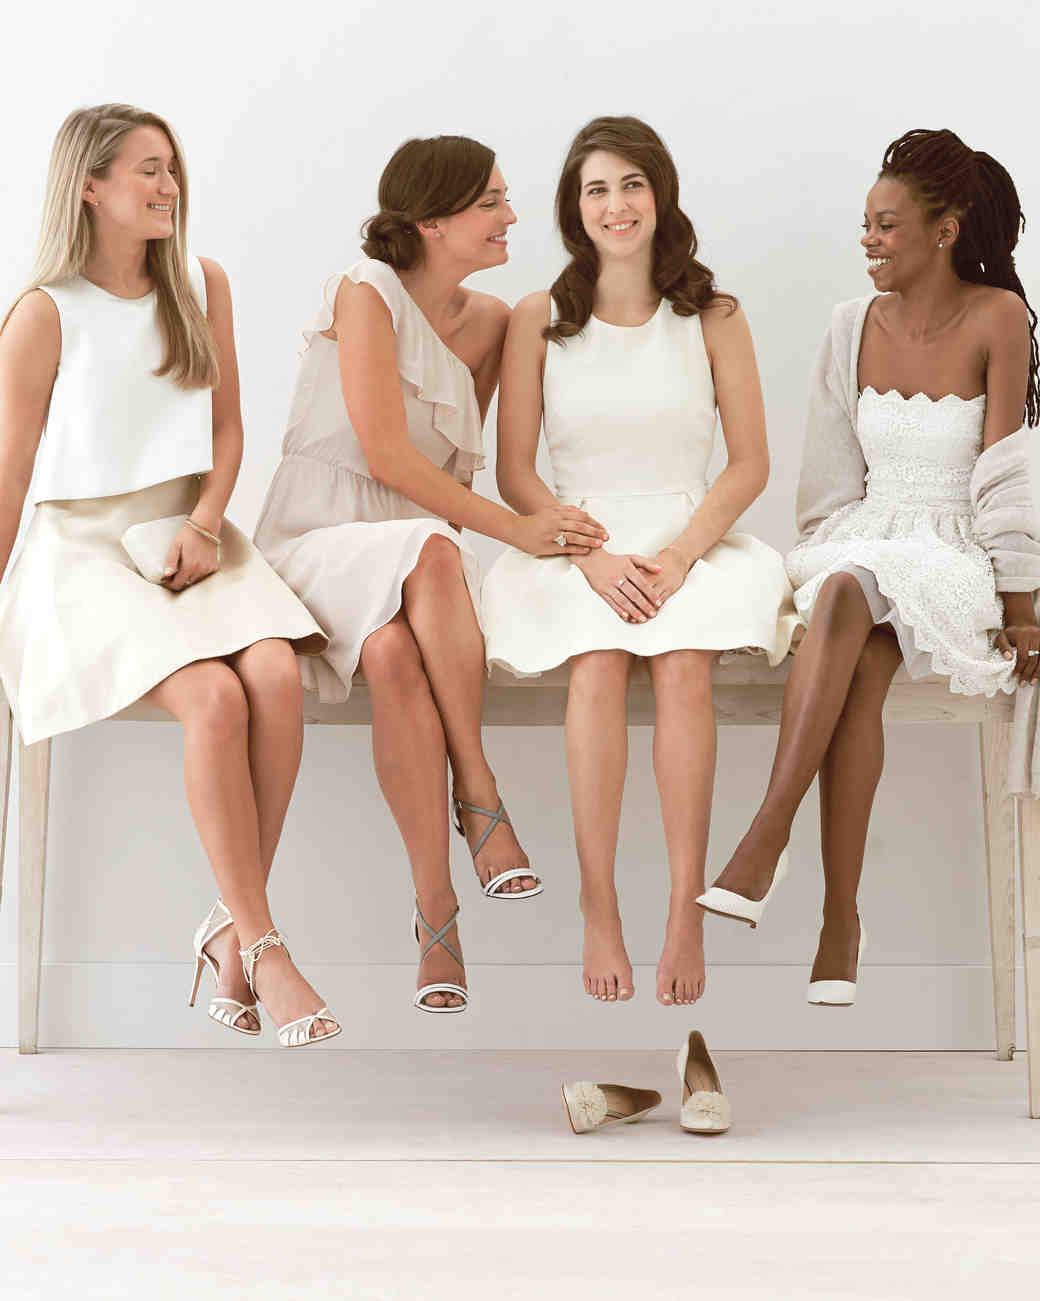 bridesmaids-0200-d111475-comp.jpg